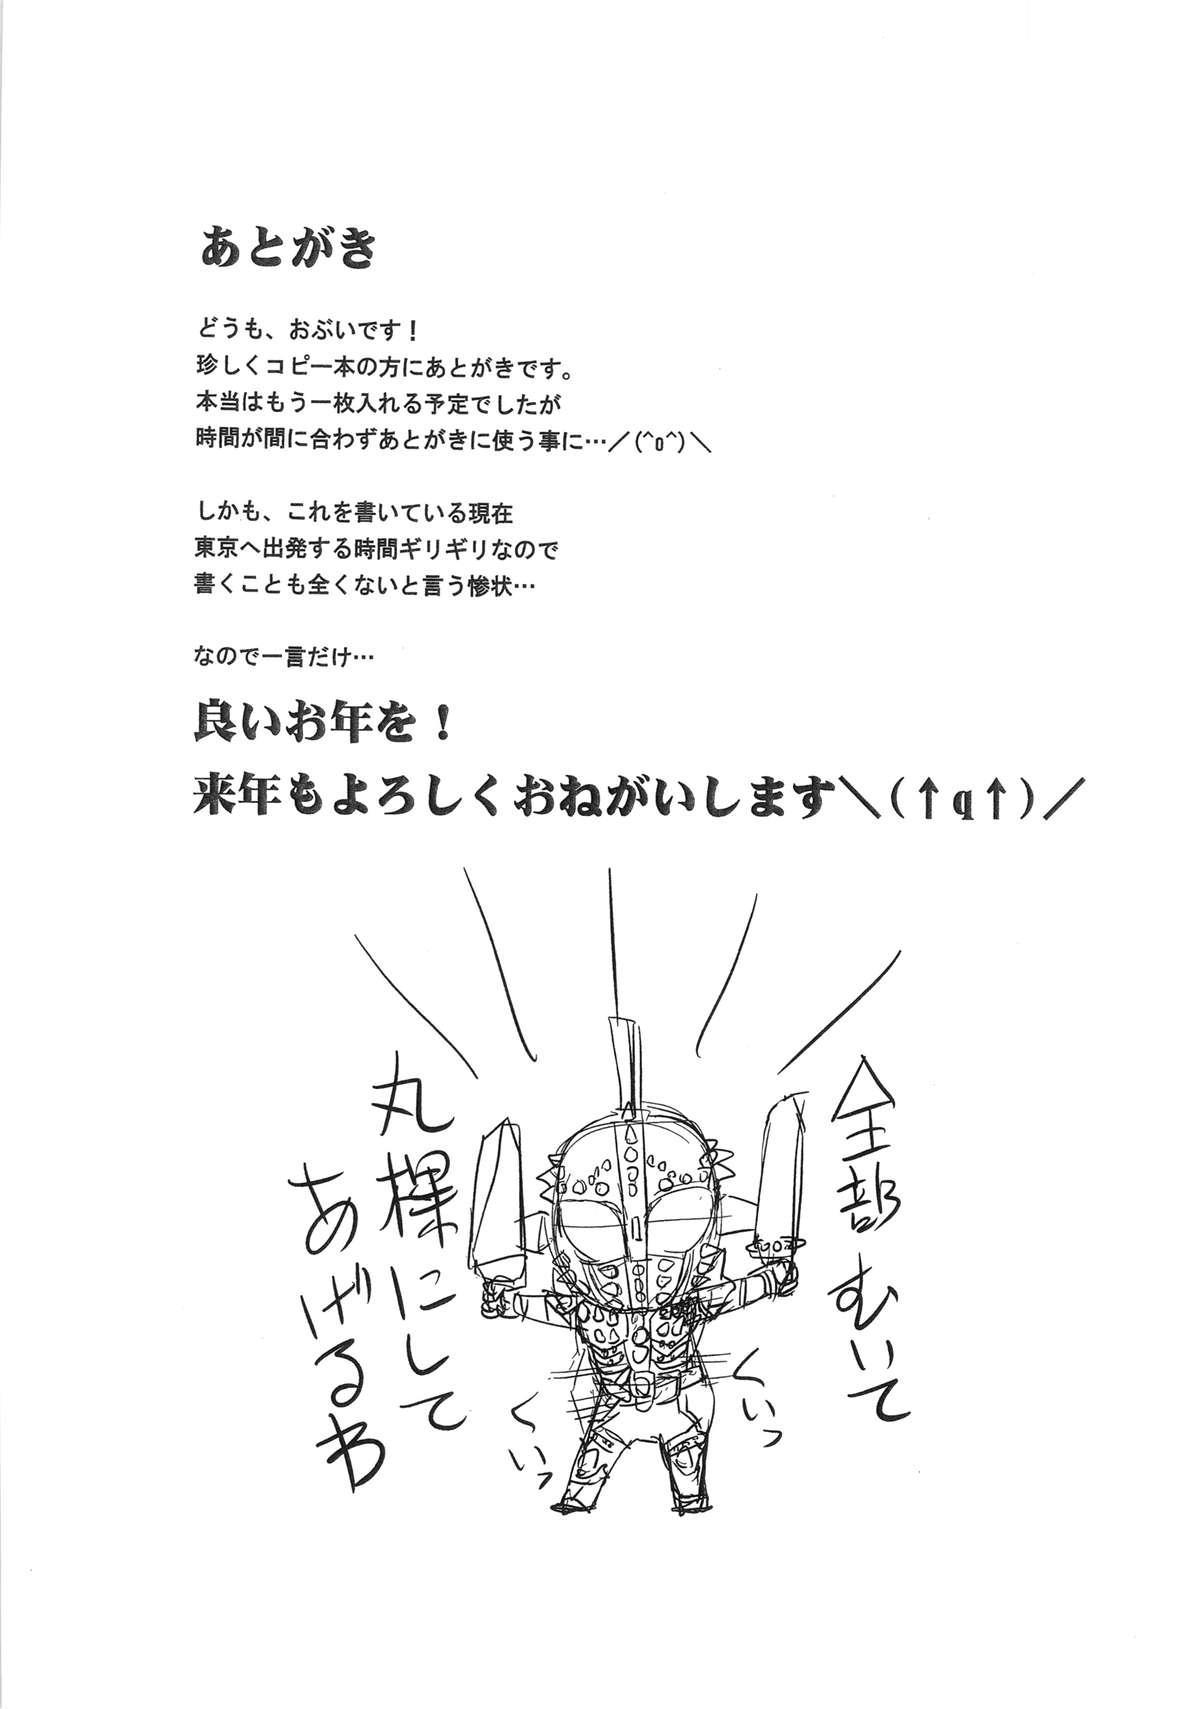 OVing no Fuyu no Omakebon 2013 6